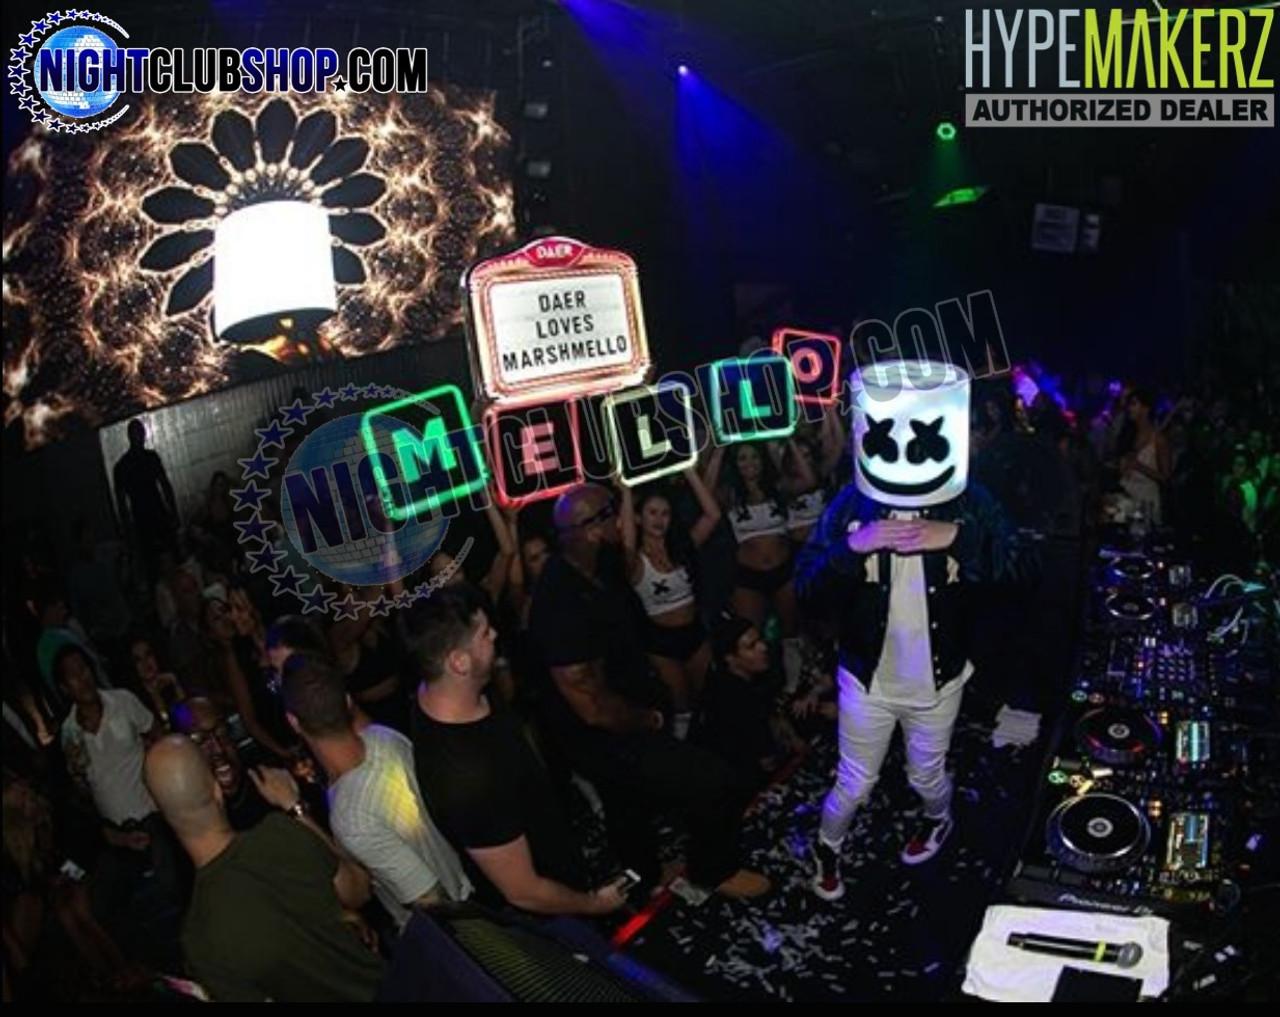 Marshmellow, Letter, Box, Shields, Interchangeable, Party, Celebration, LED, RGB, Remote, controlled, Mello